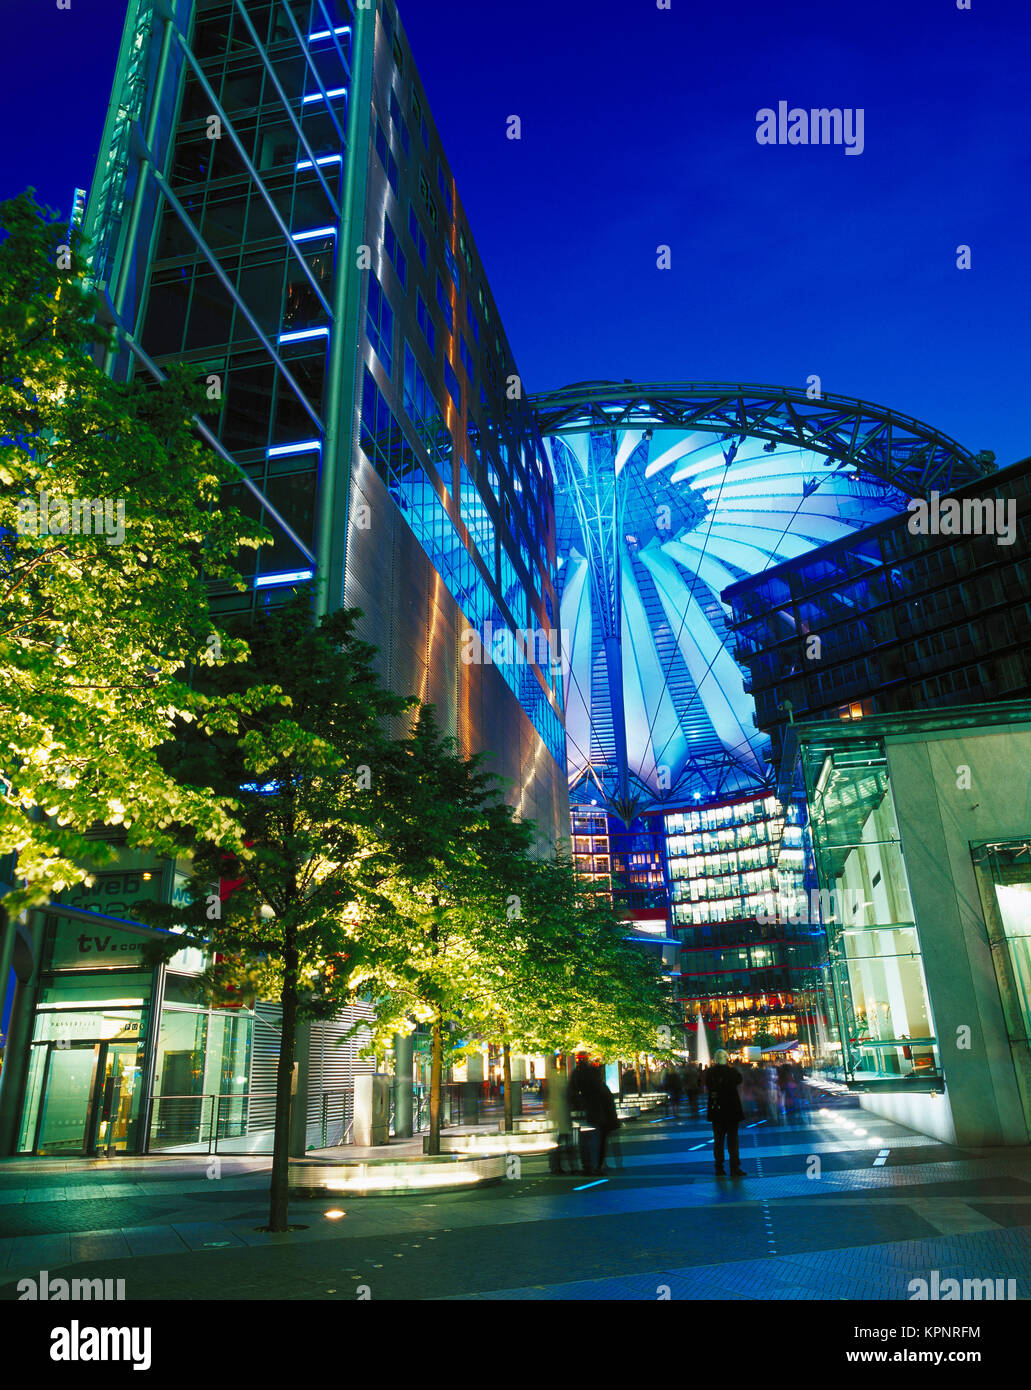 Sony Center, Potsdamer Platz, Berlin, Allemagne Photo Stock